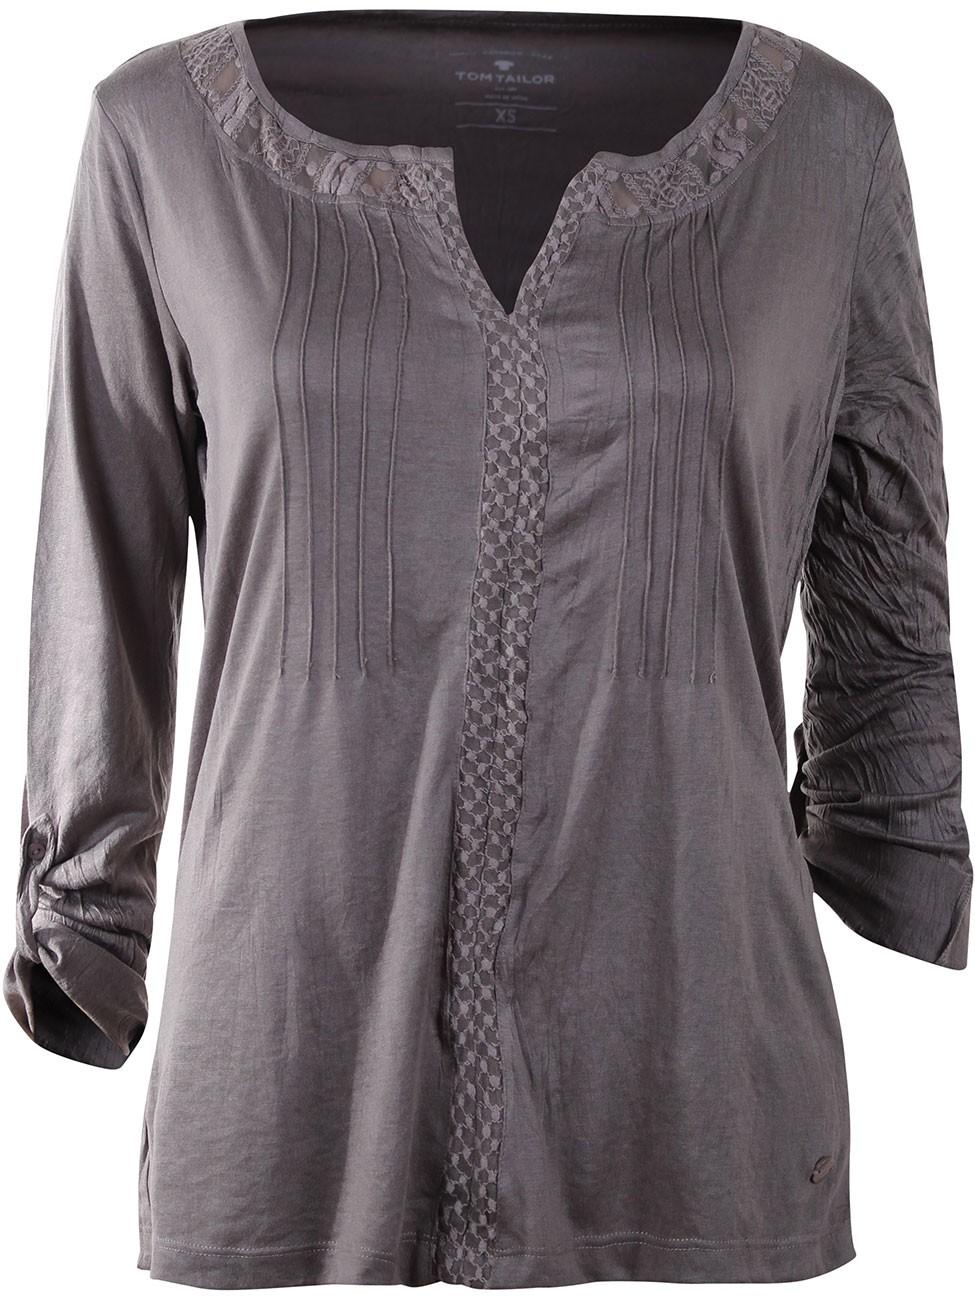 tom tailor damen tunika bluse beautiful crinkle ebay. Black Bedroom Furniture Sets. Home Design Ideas